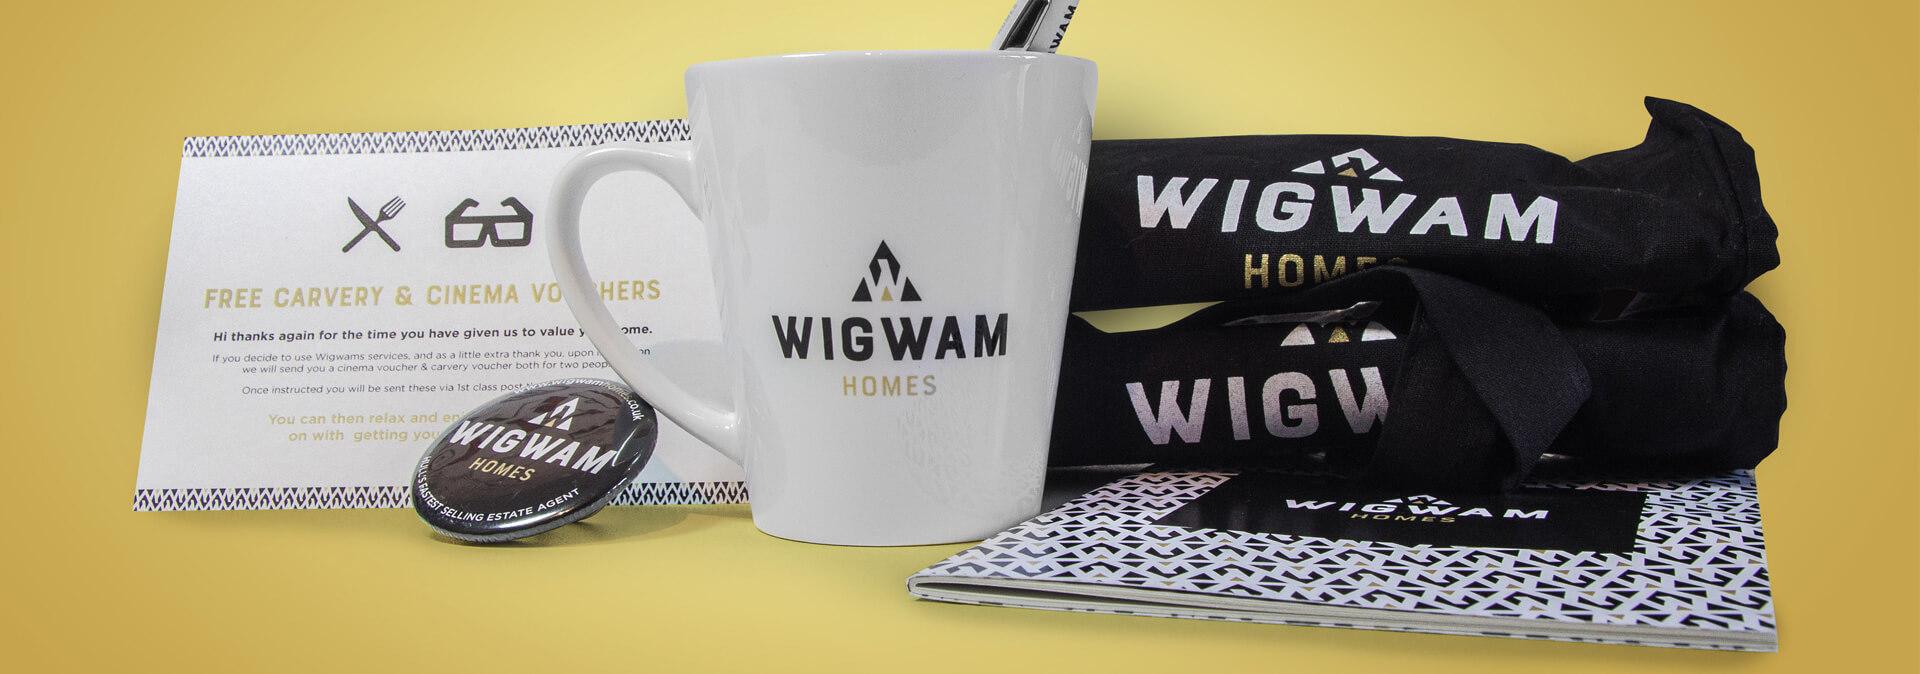 Wigwam Homes Estate Agents